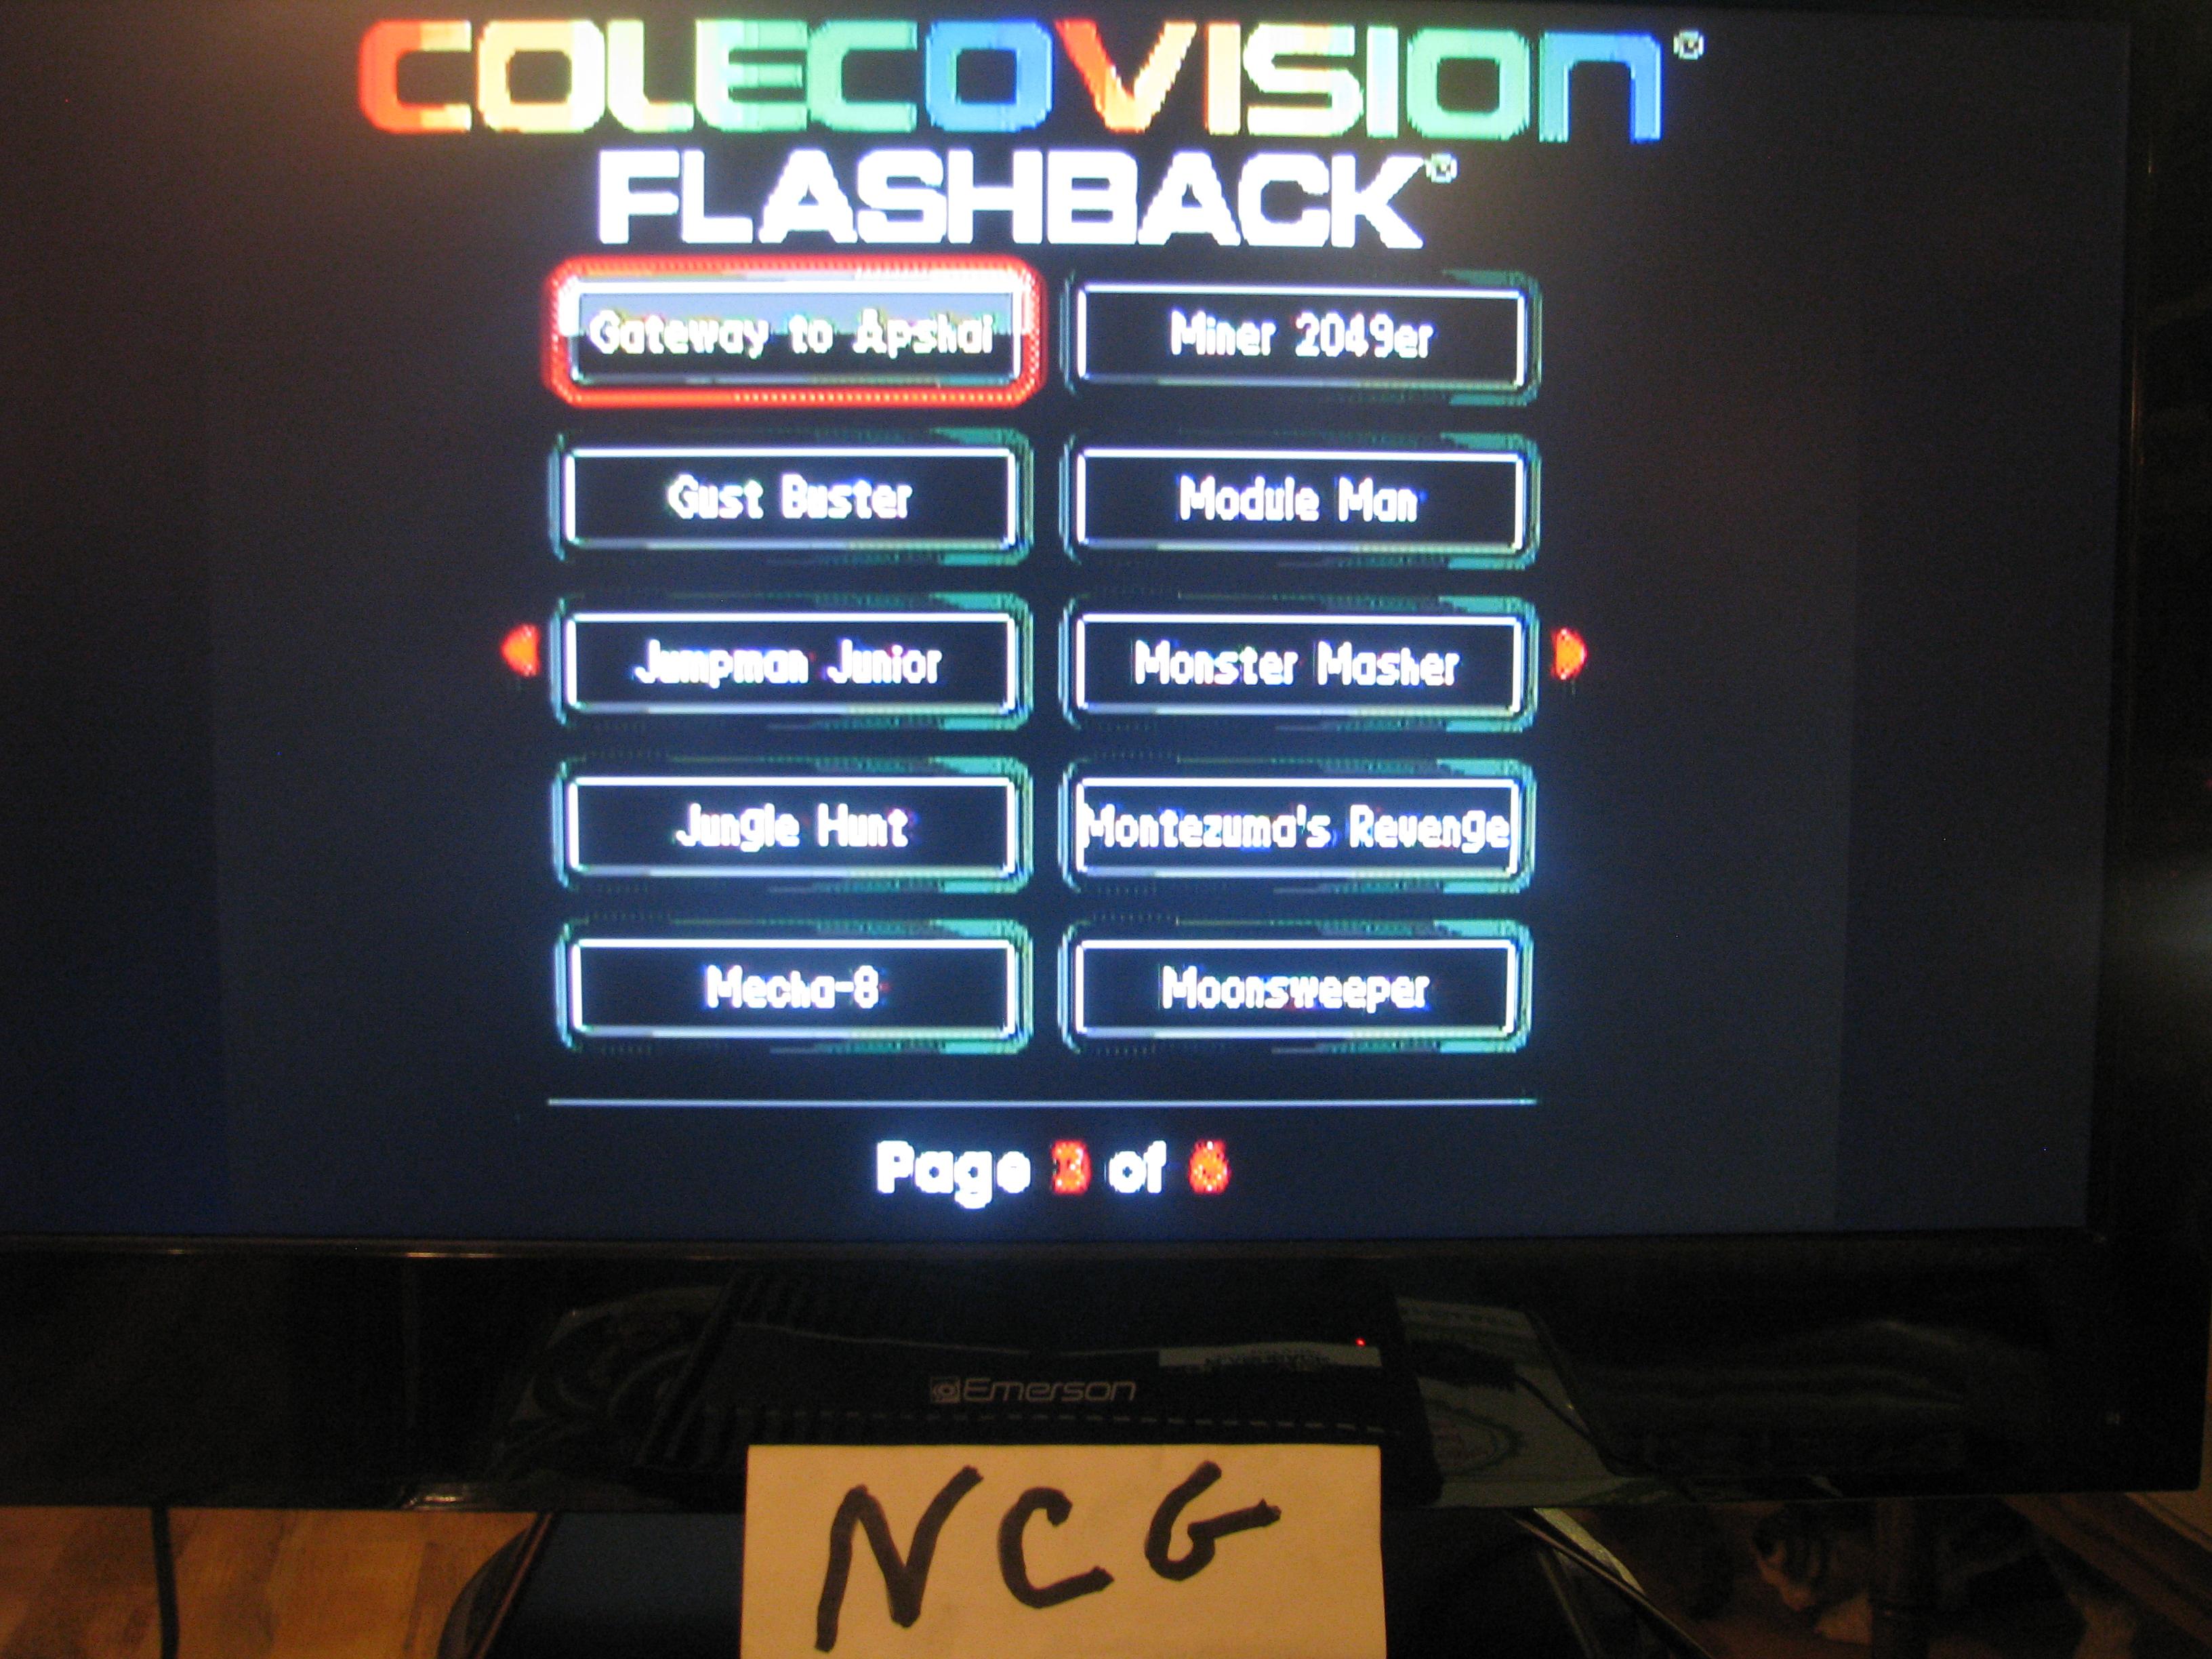 NorthCoastGamer: Gateway to Apshai (Colecovision Flashback) 14,910 points on 2015-01-03 21:59:47